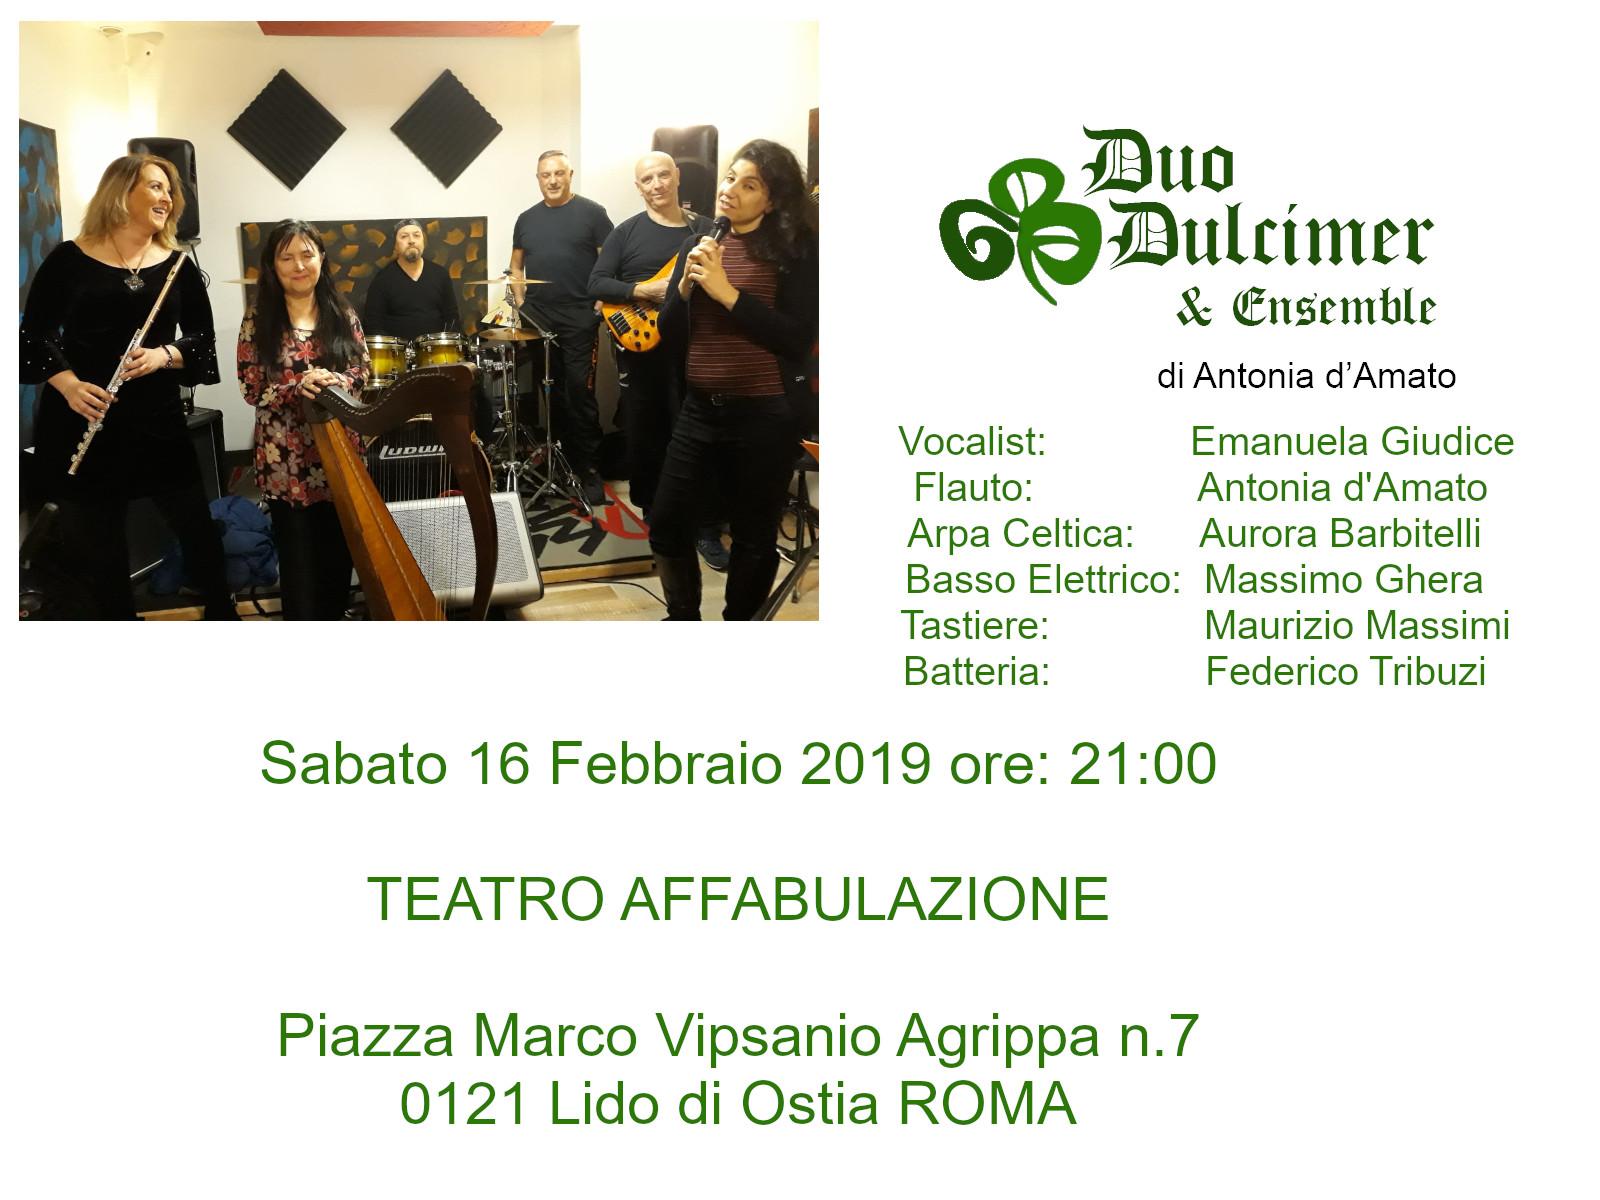 Duo Dulcimer & Ensemble